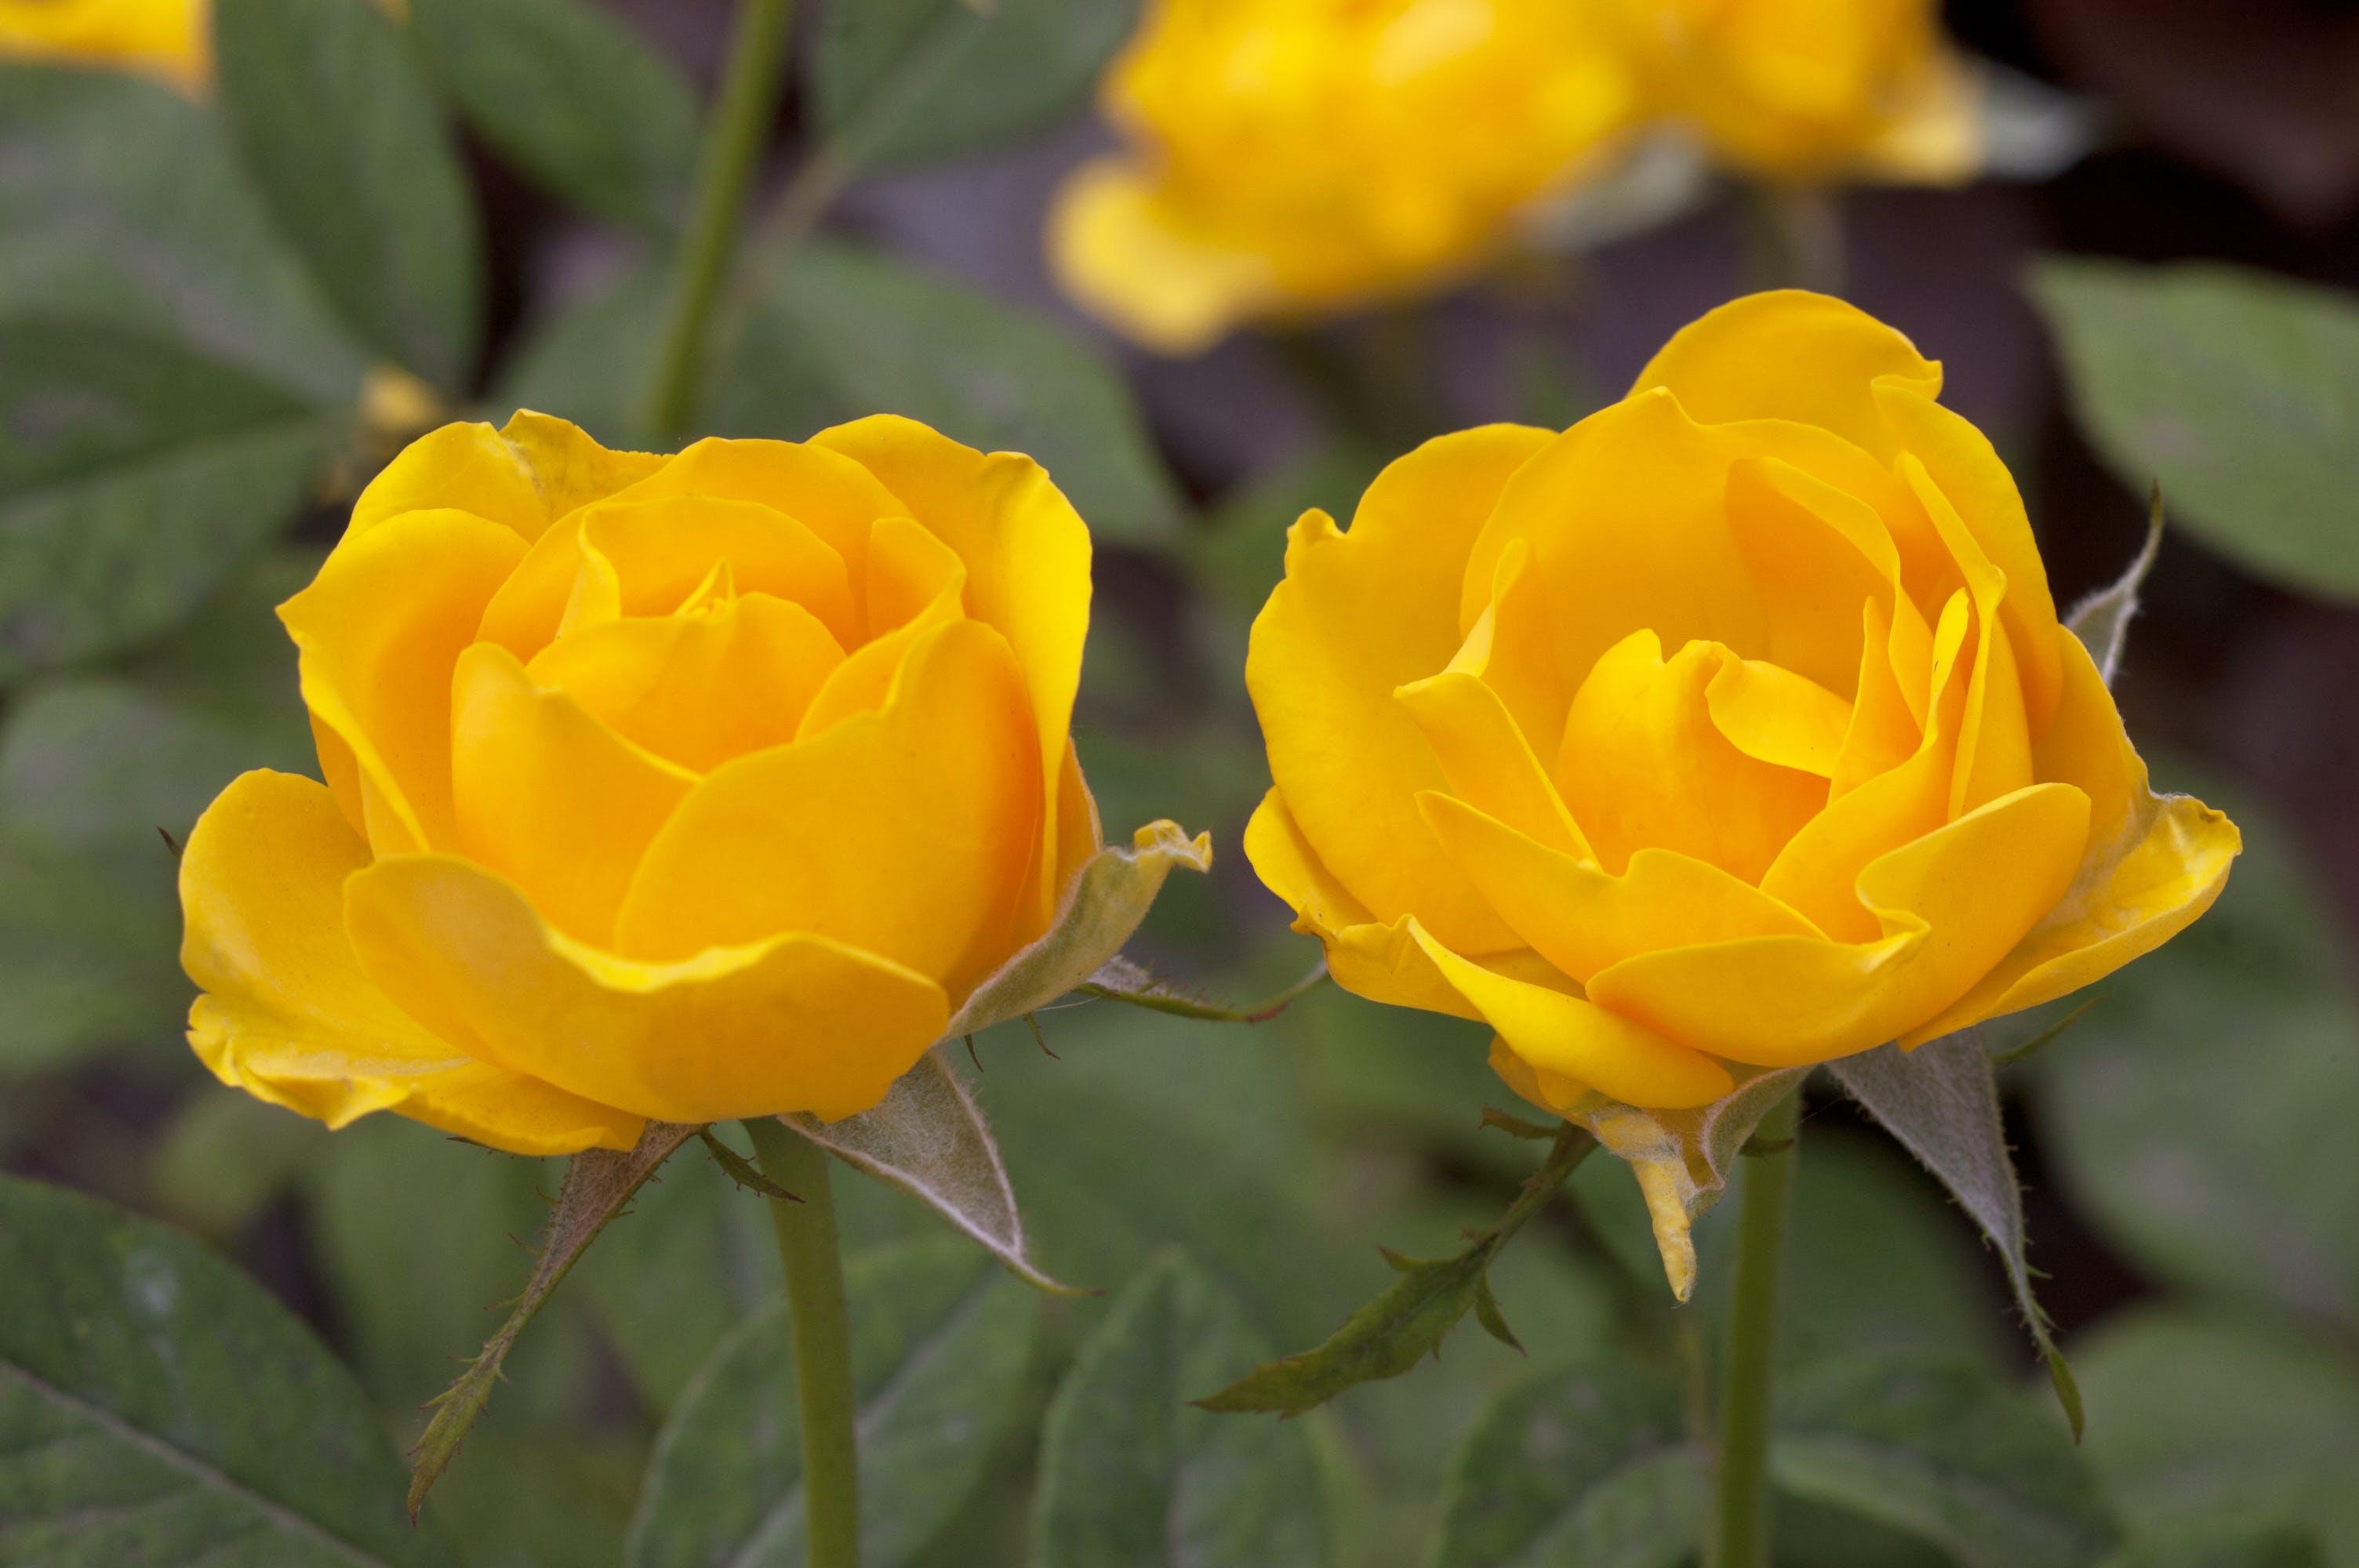 Free stock photo of Rose Yellow Rose